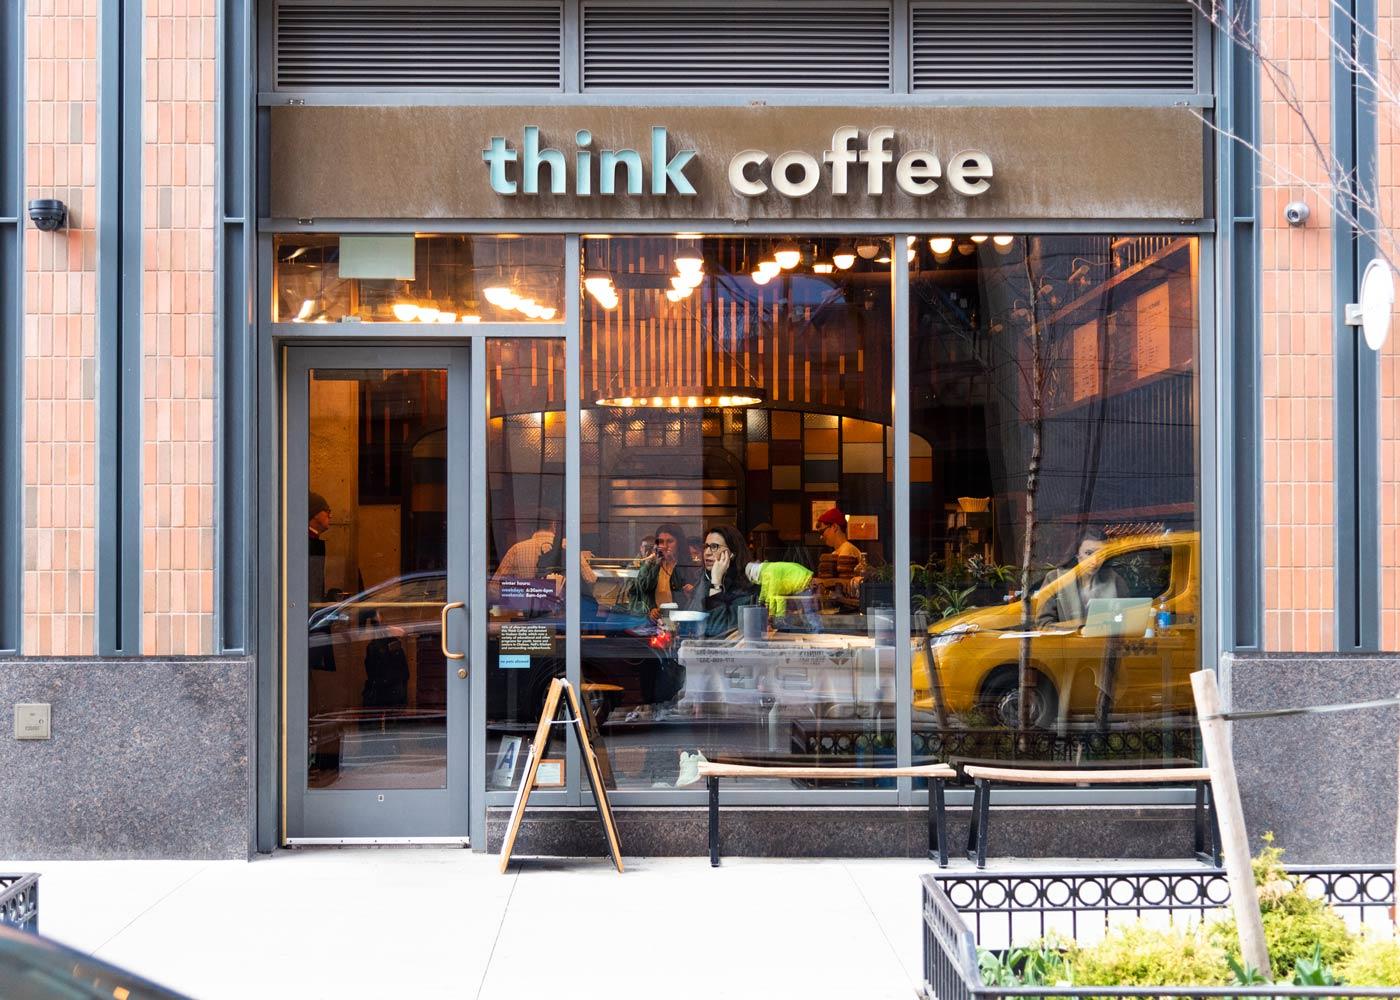 20180420_thinkcoffee_hudson5.jpg